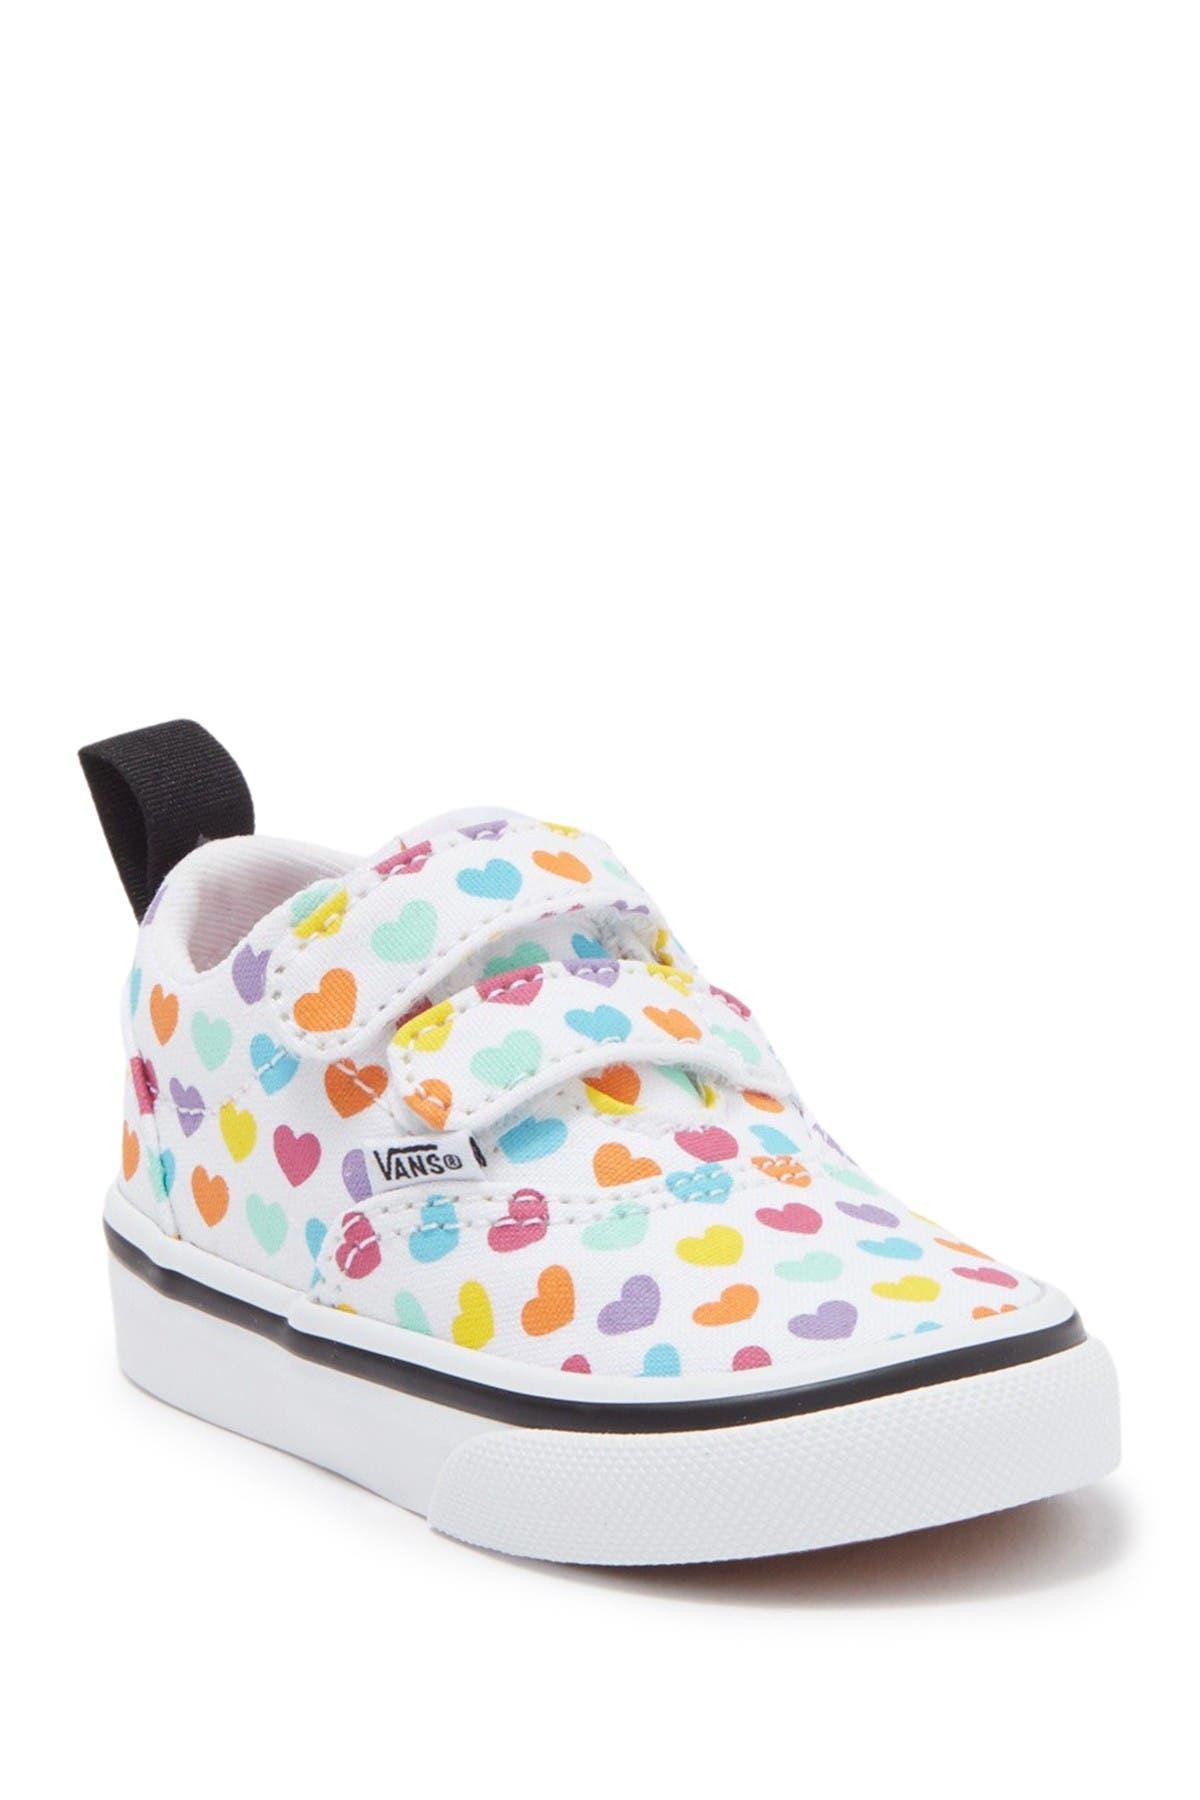 Image of VANS Doheny Sneaker